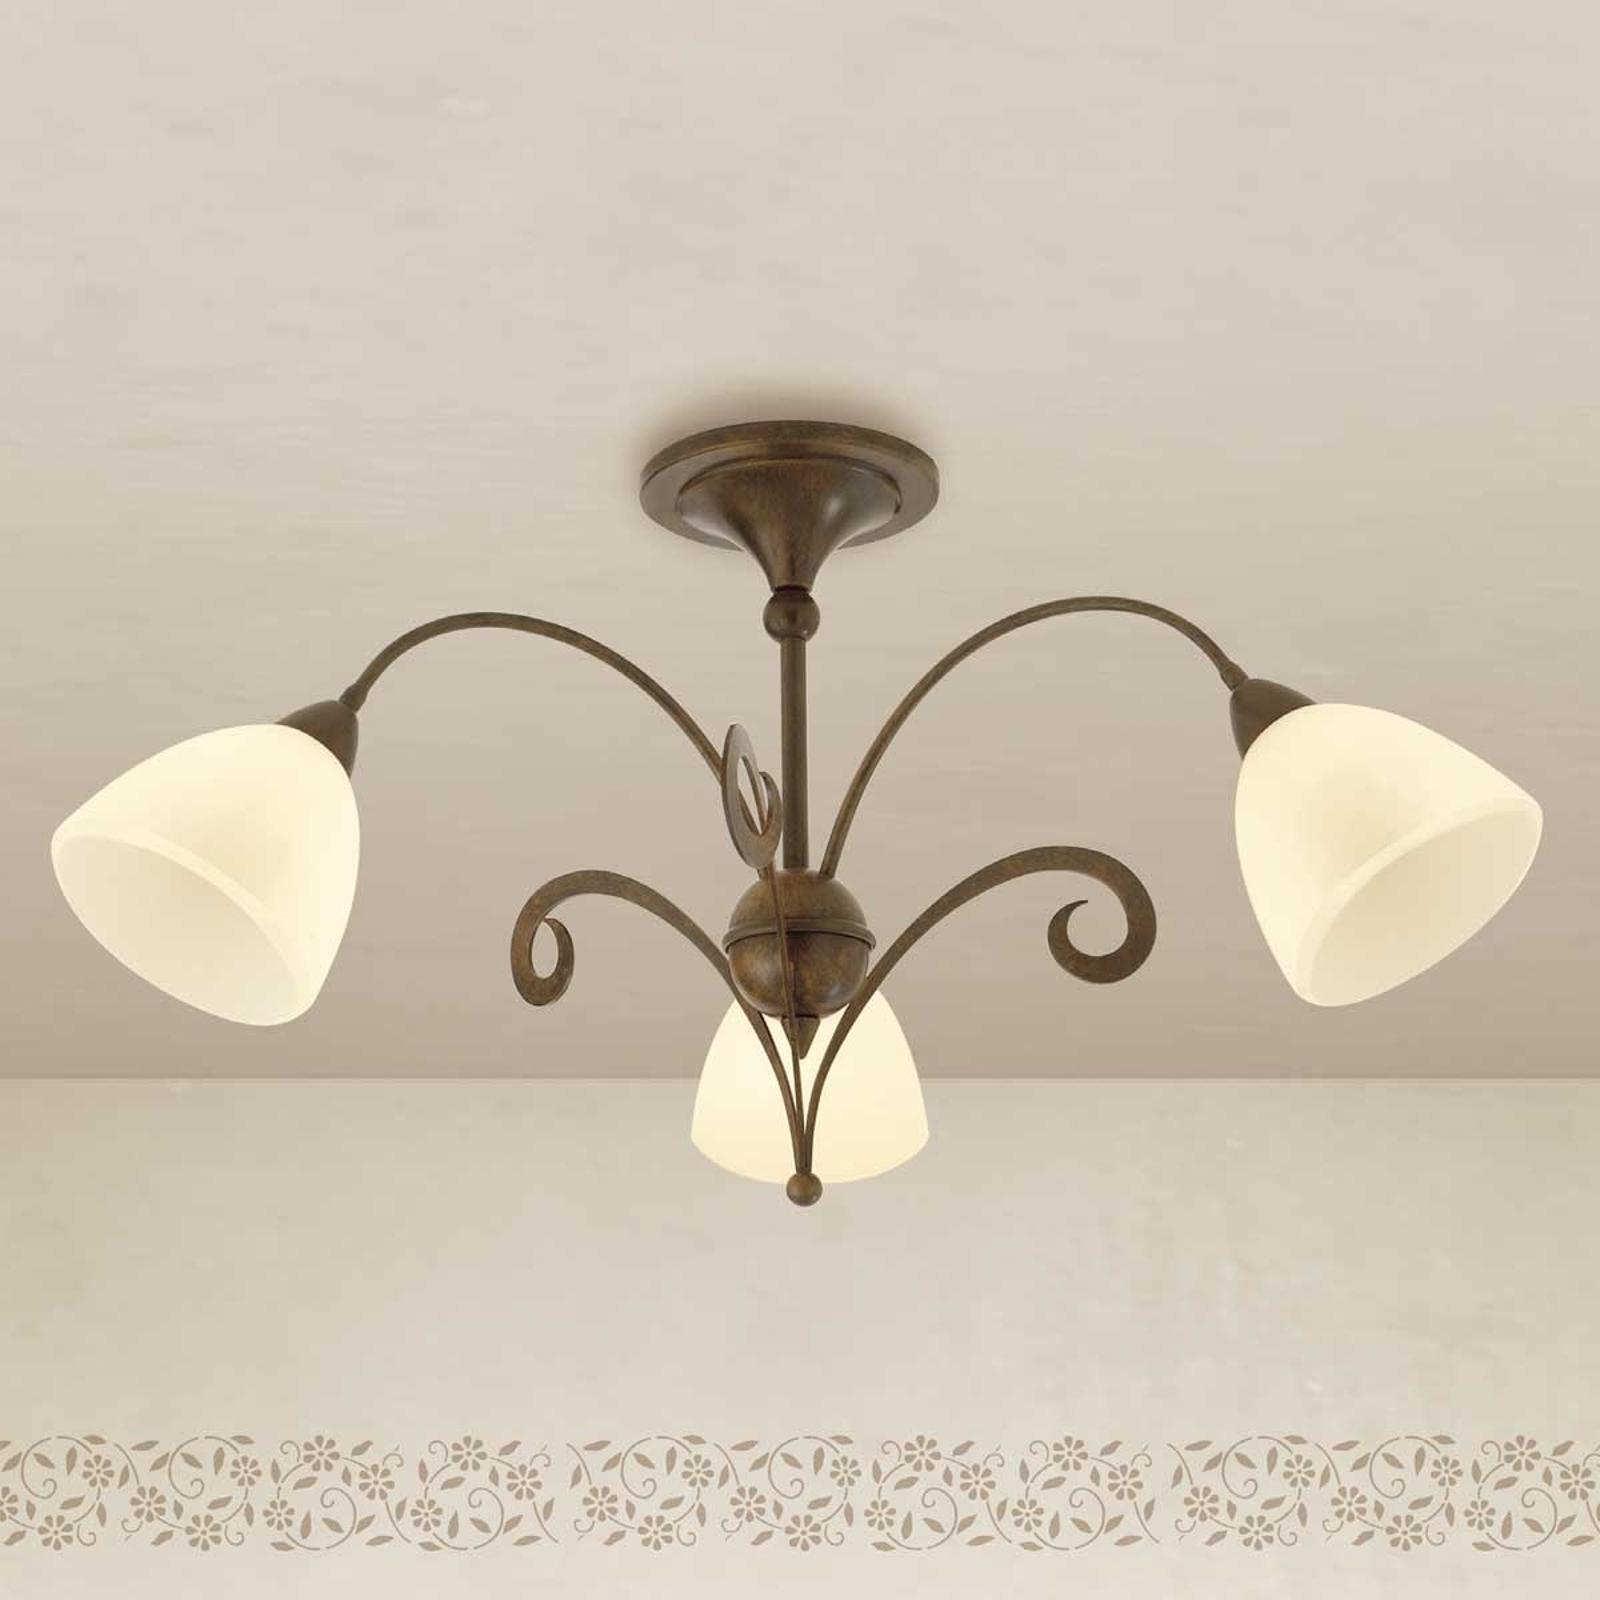 Rustykalna lampa sufitowa Luca 3-punktowa